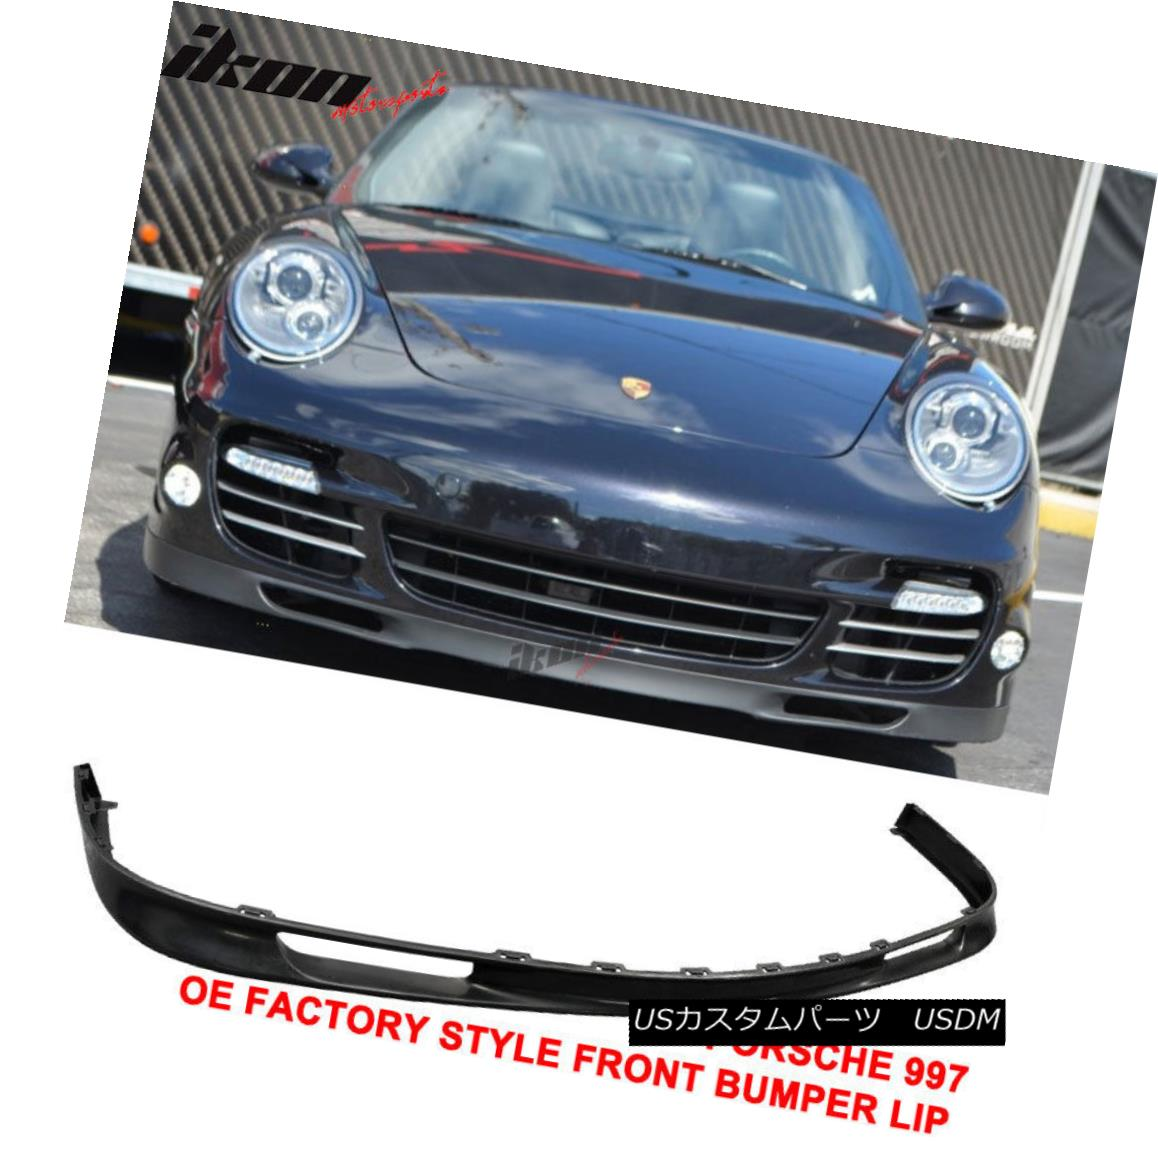 Fits 06-12 Porsche 997 OE Factory Style Front Bumper Lip Unpainted Urethane PU